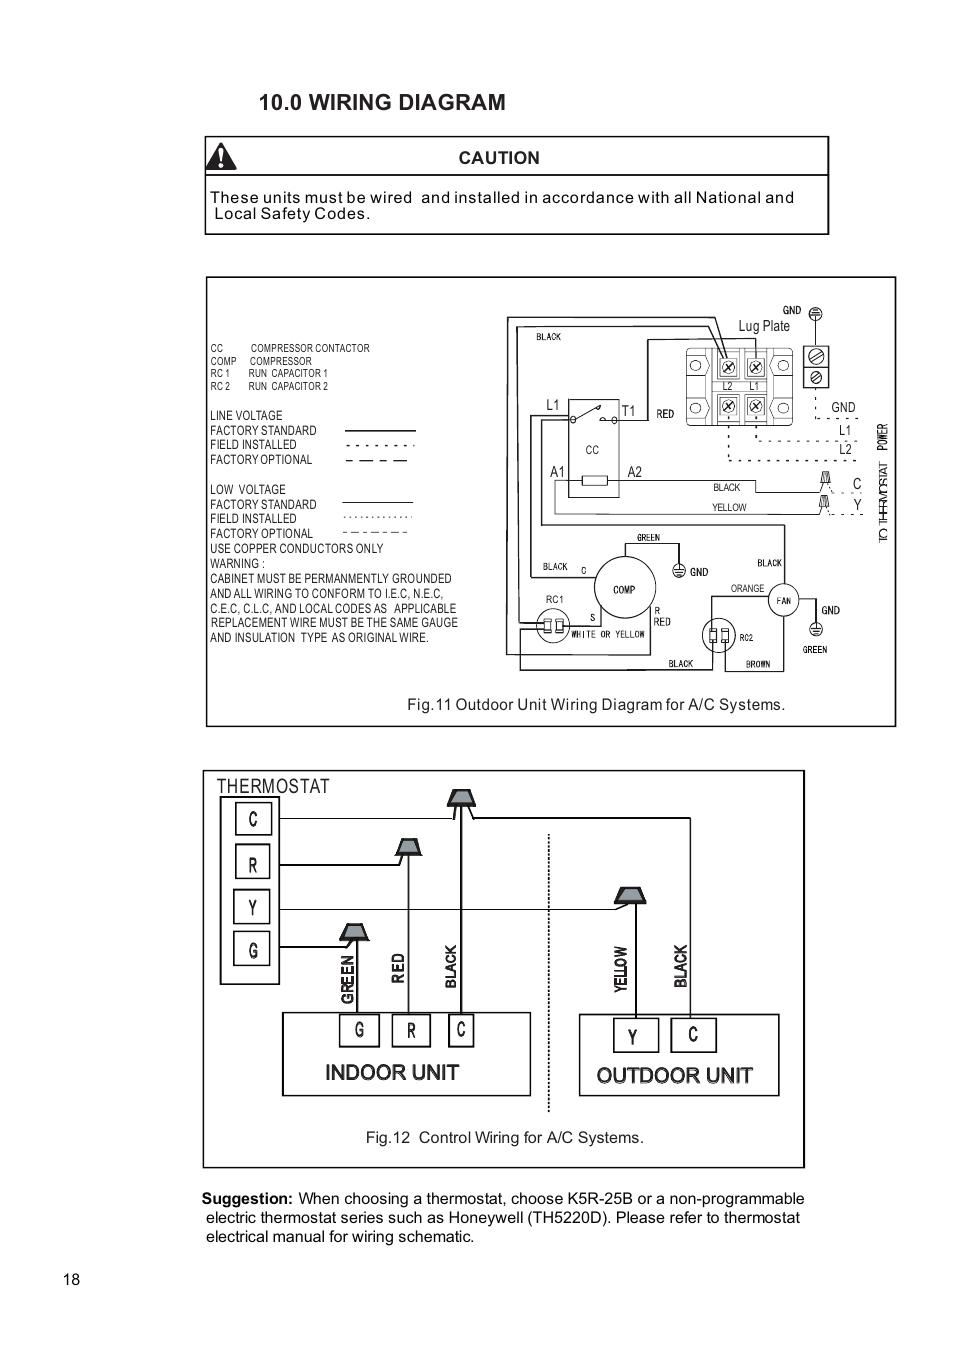 hight resolution of klimaire wiring diagram wiring diagram page klimaire mini split wiring diagram klimaire mini split wiring diagram